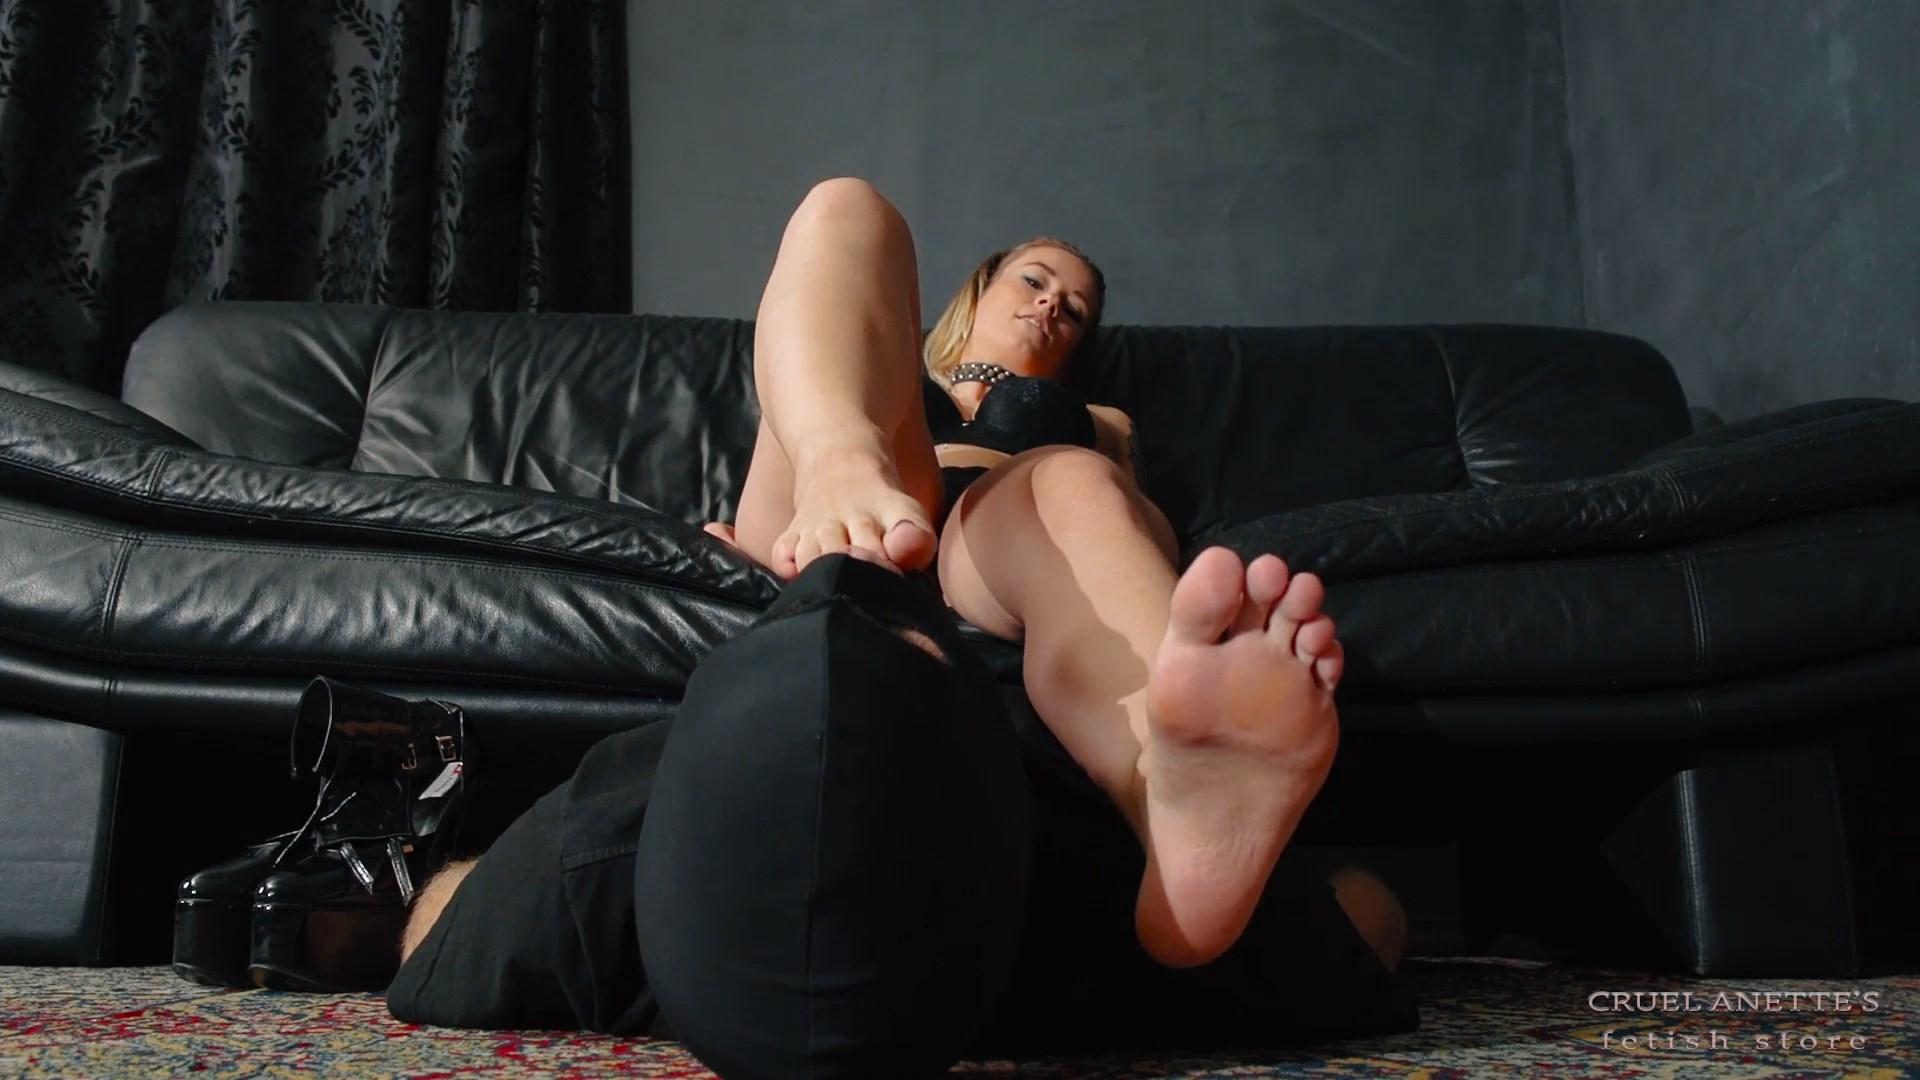 Lick my soles - CRUEL ANETTES FETISH STORE - FULL HD/1080p/MP4